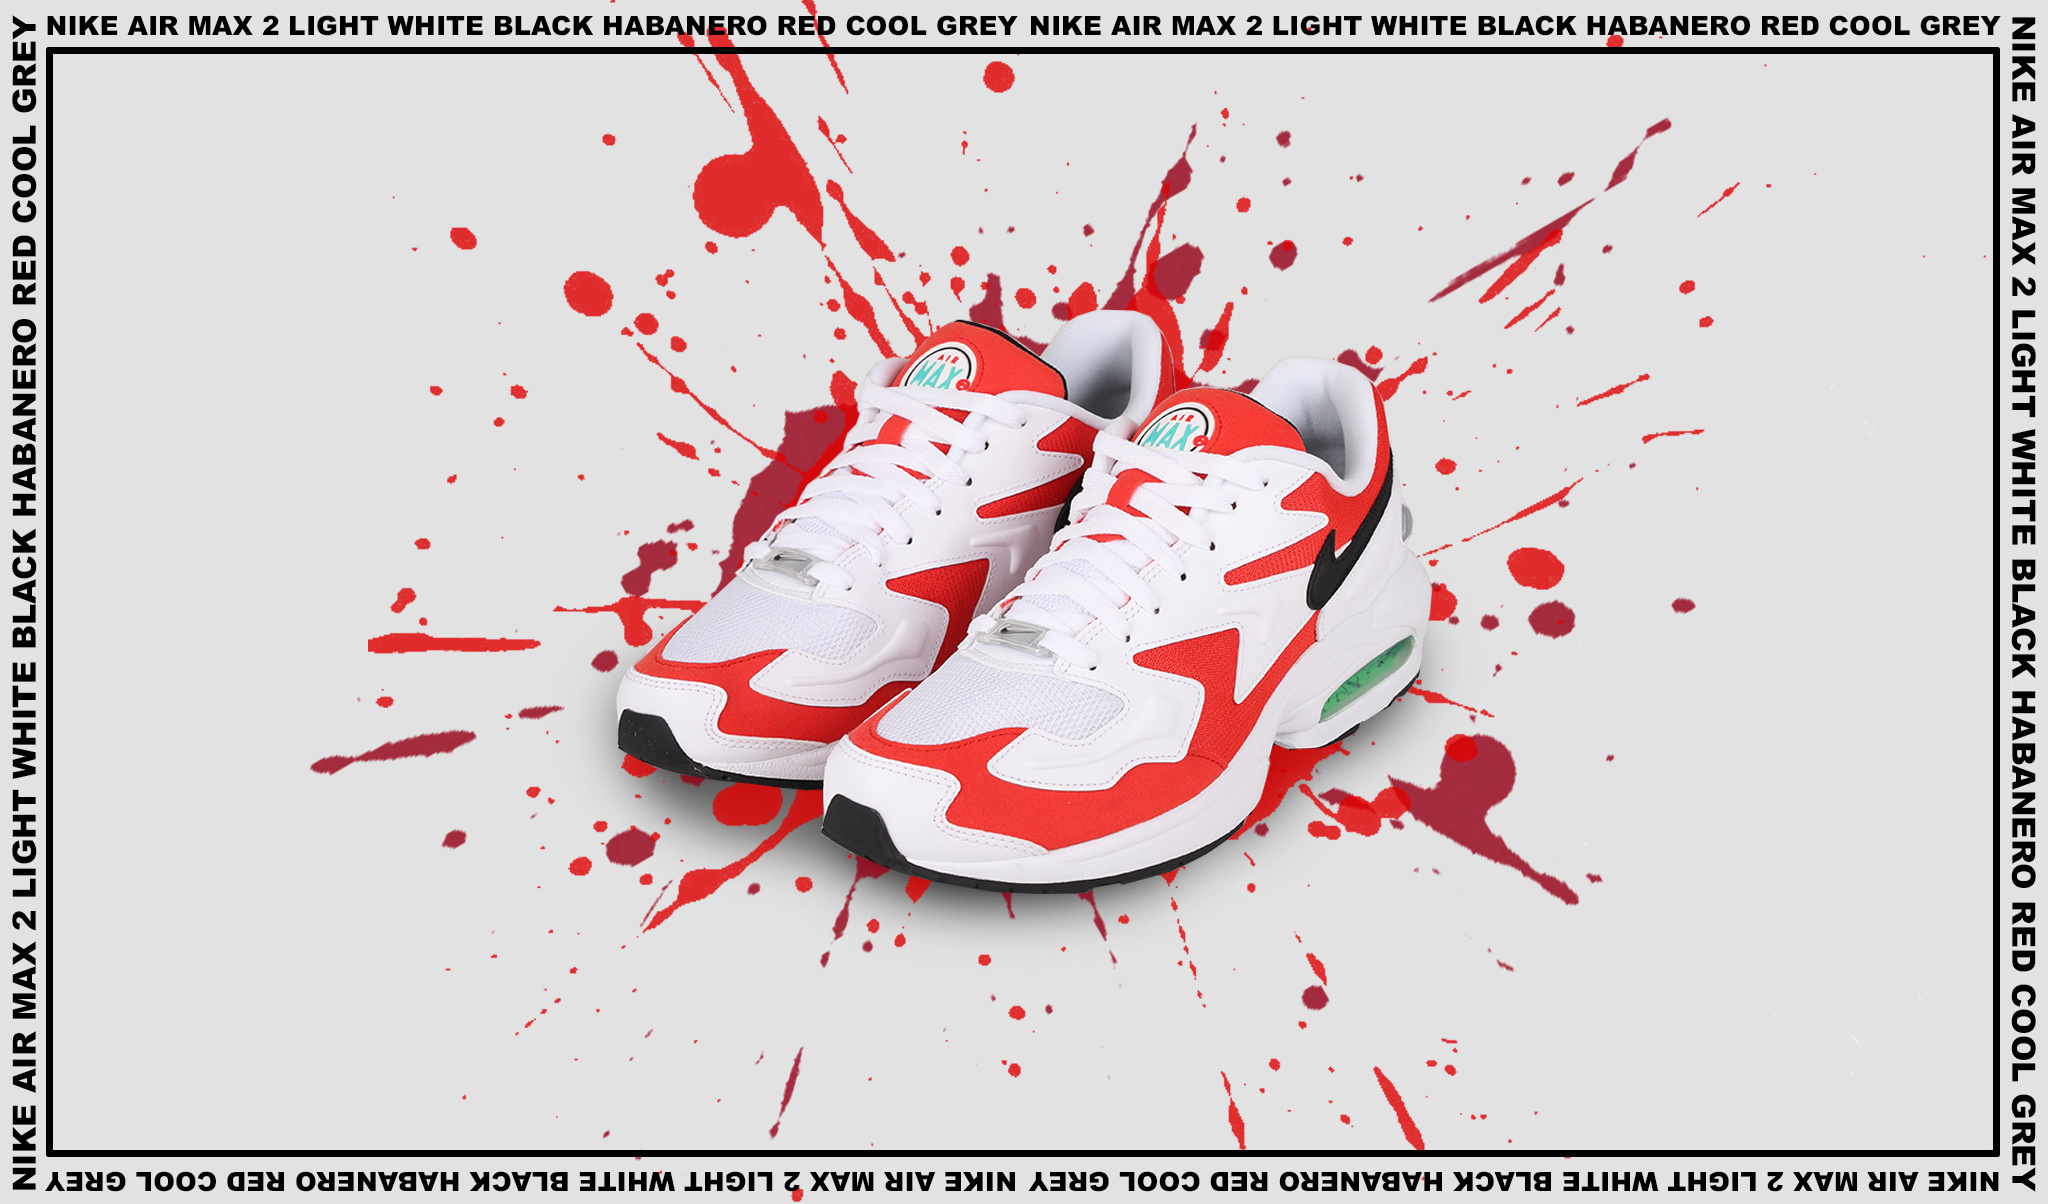 Nike Air Max 2 Habanero Red